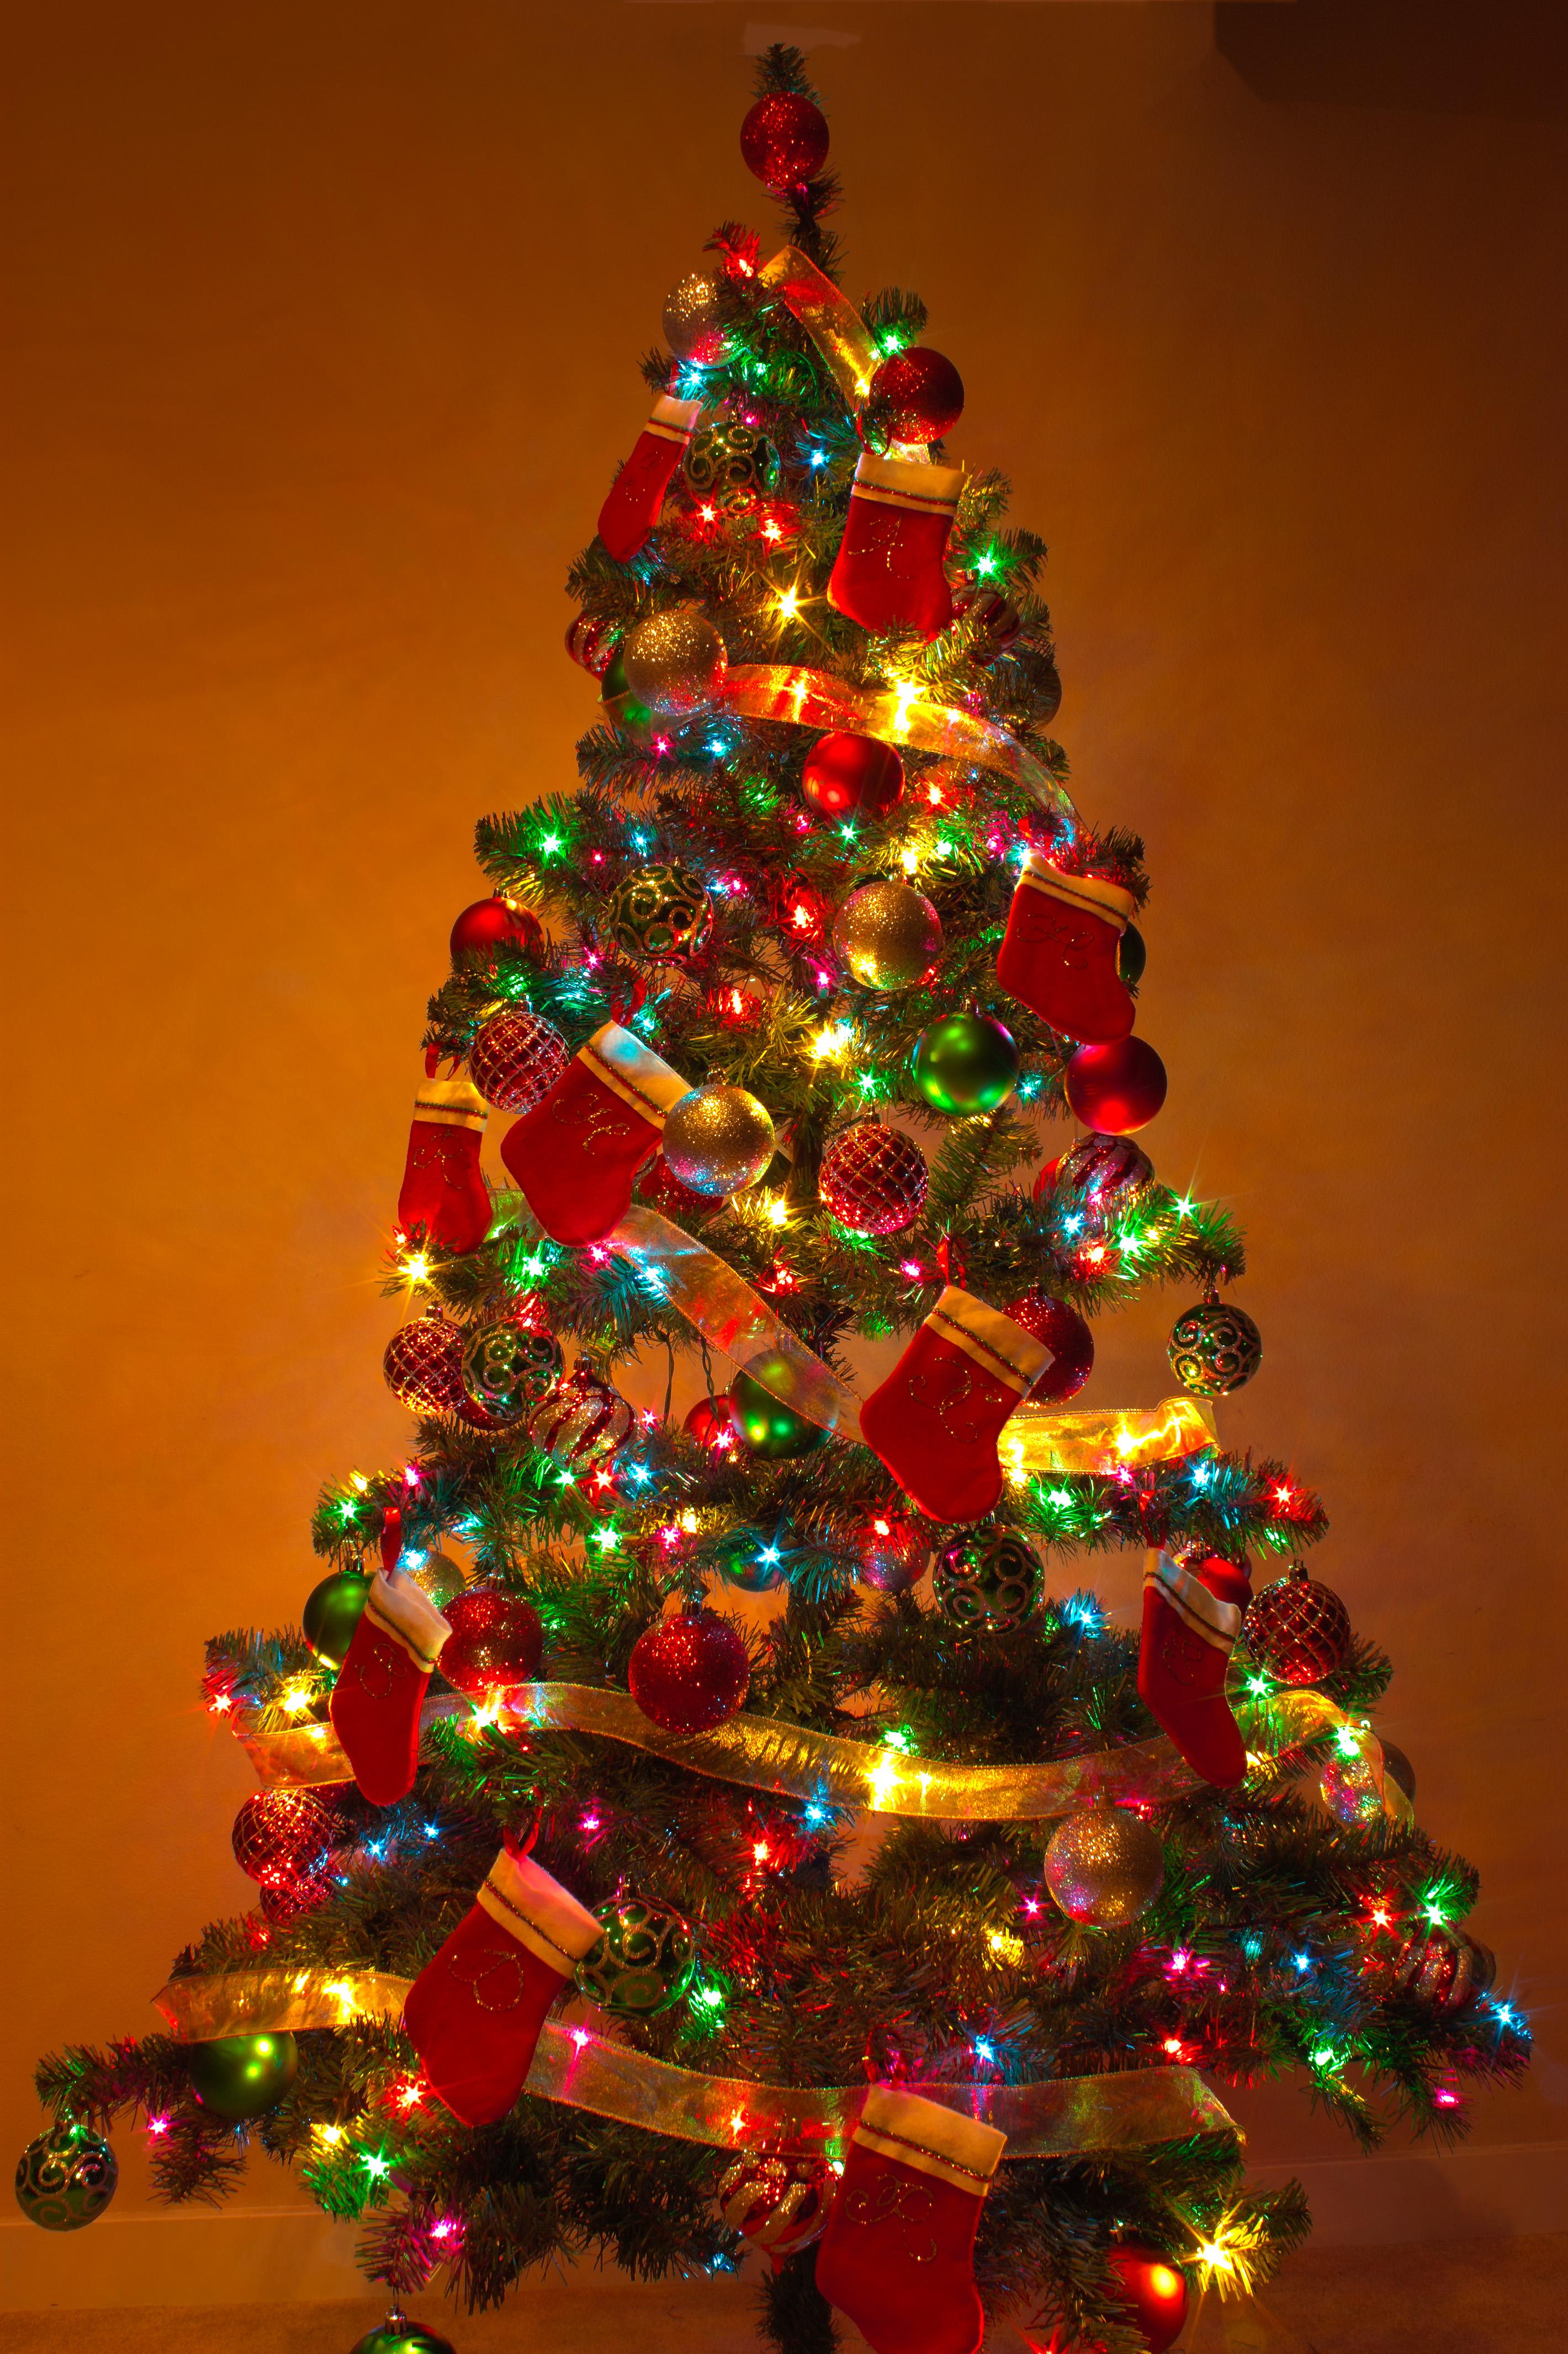 File:Y Christmas Tree 2.jpg - Wikimedia Commons